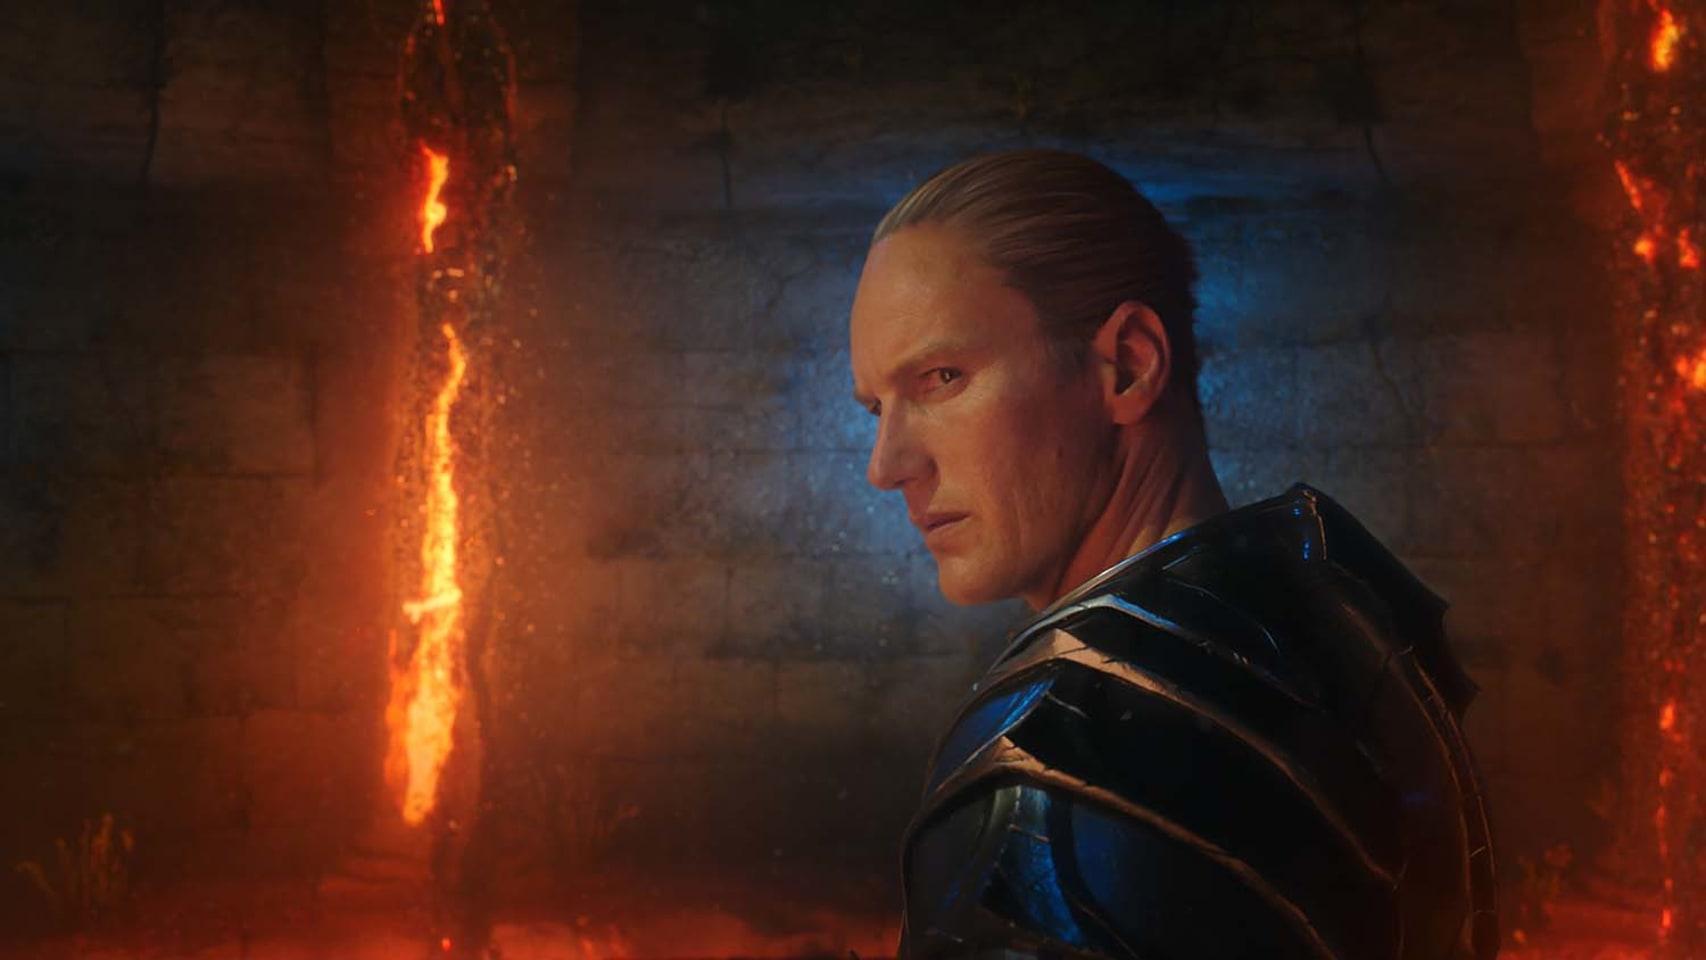 Patrick Wilson as King Orm